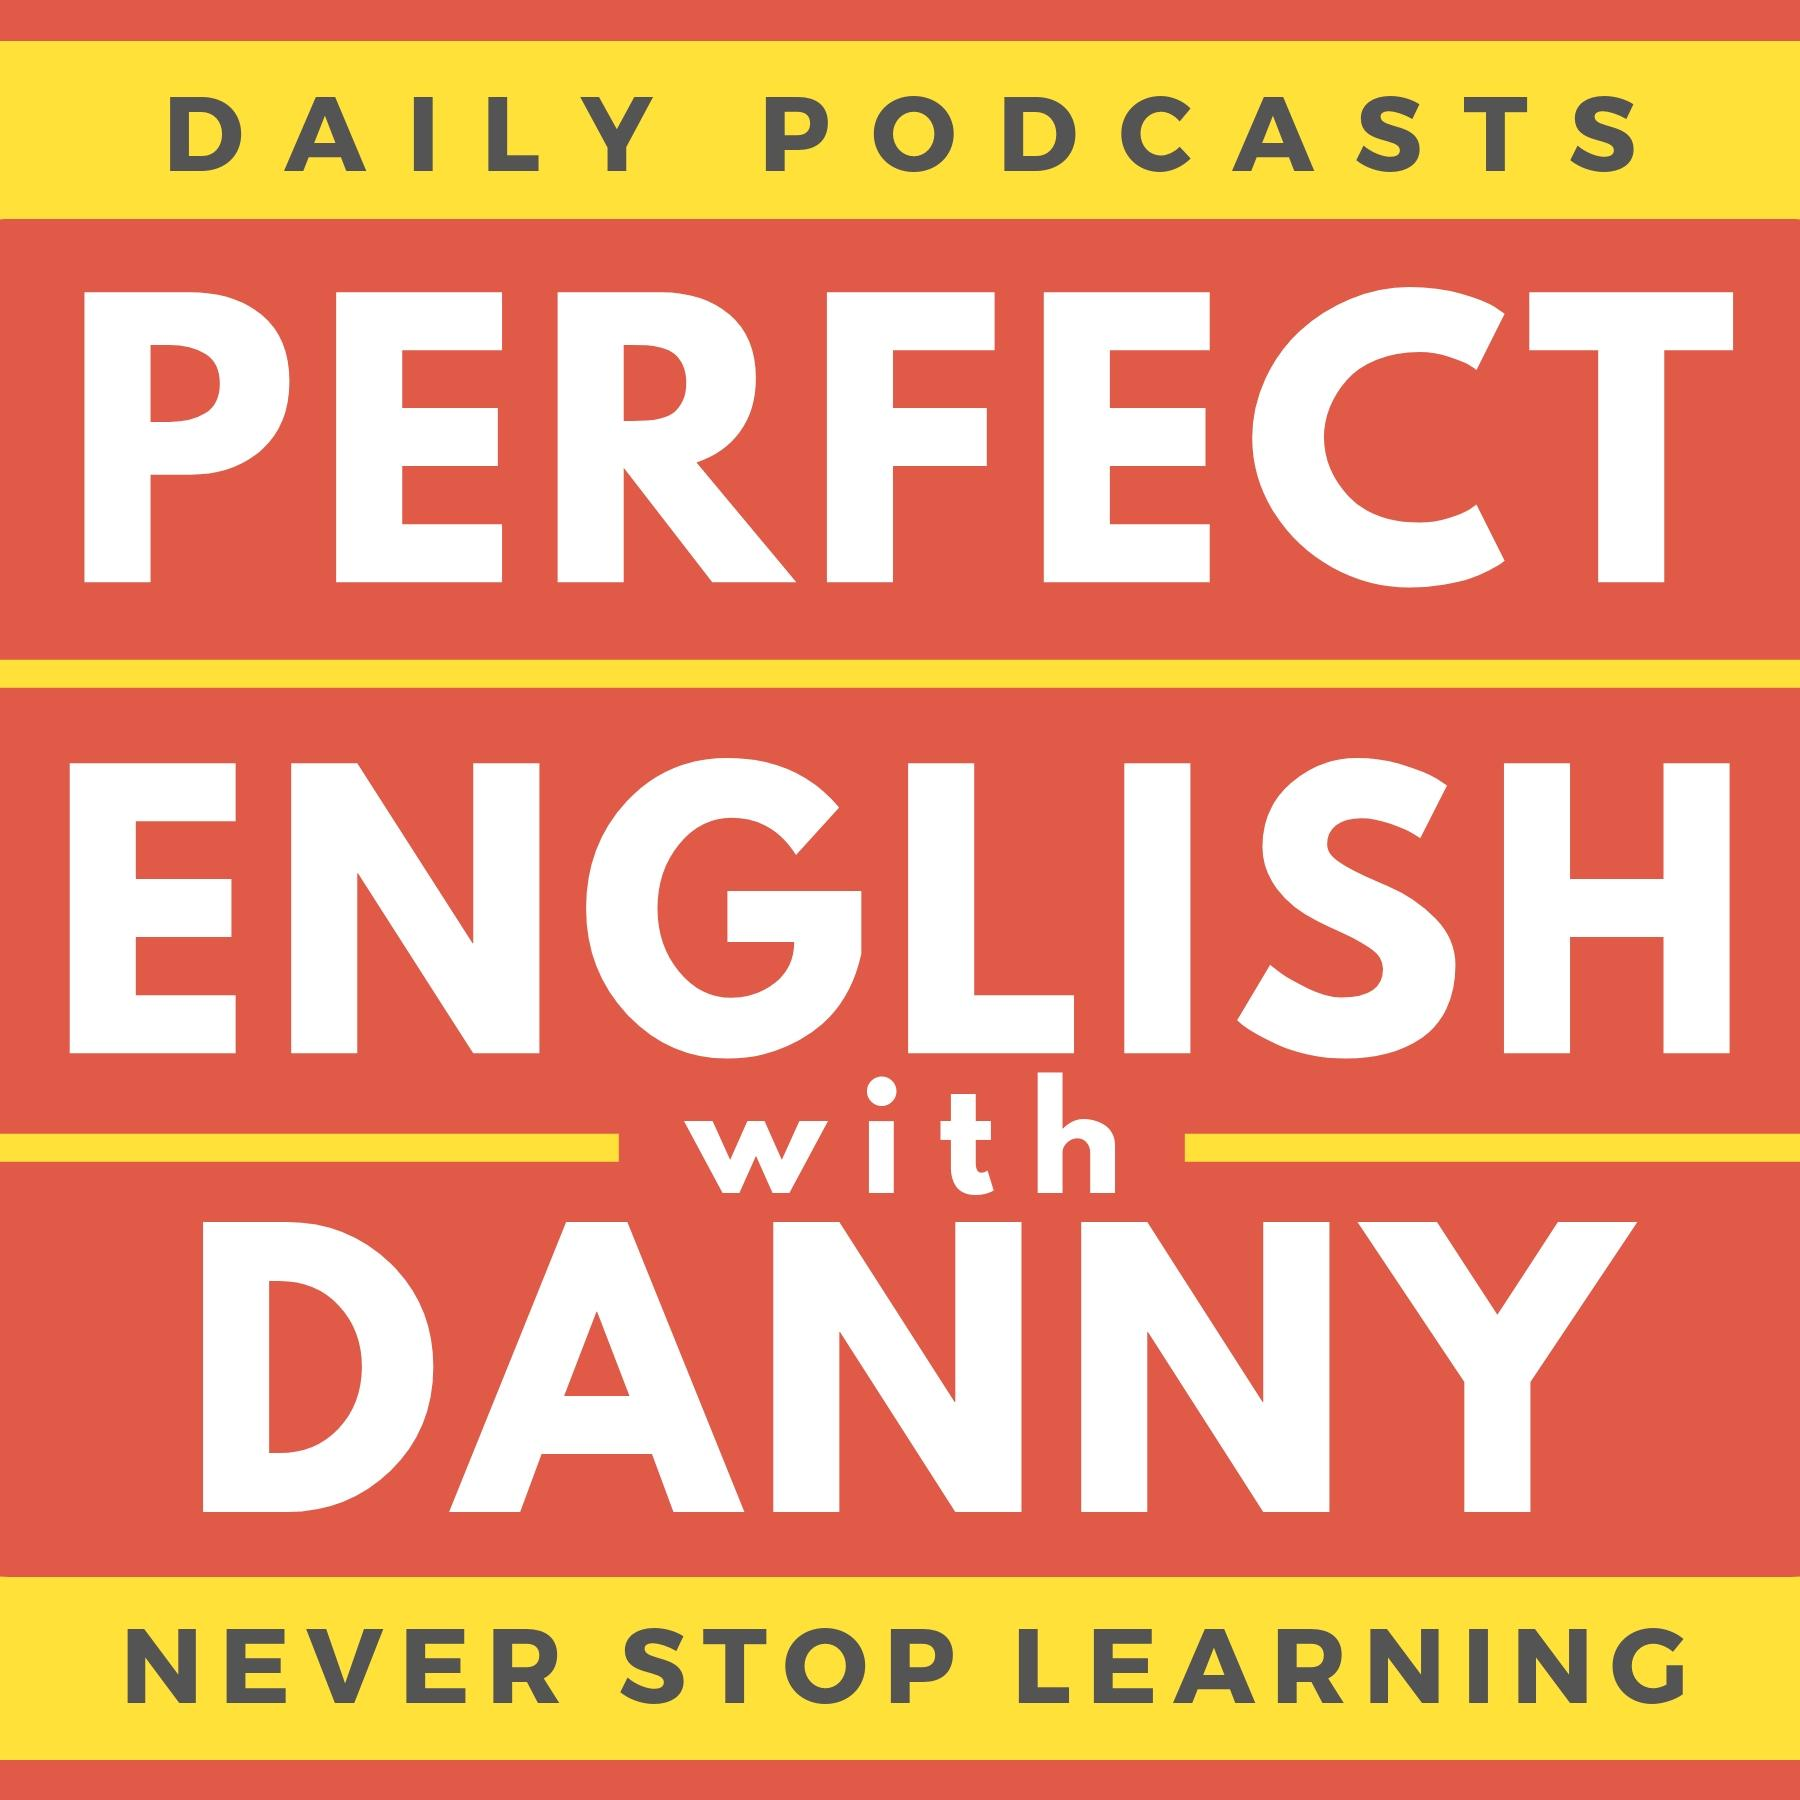 Episode 131 - Vocabulary Builder - Describing Personality 1-1